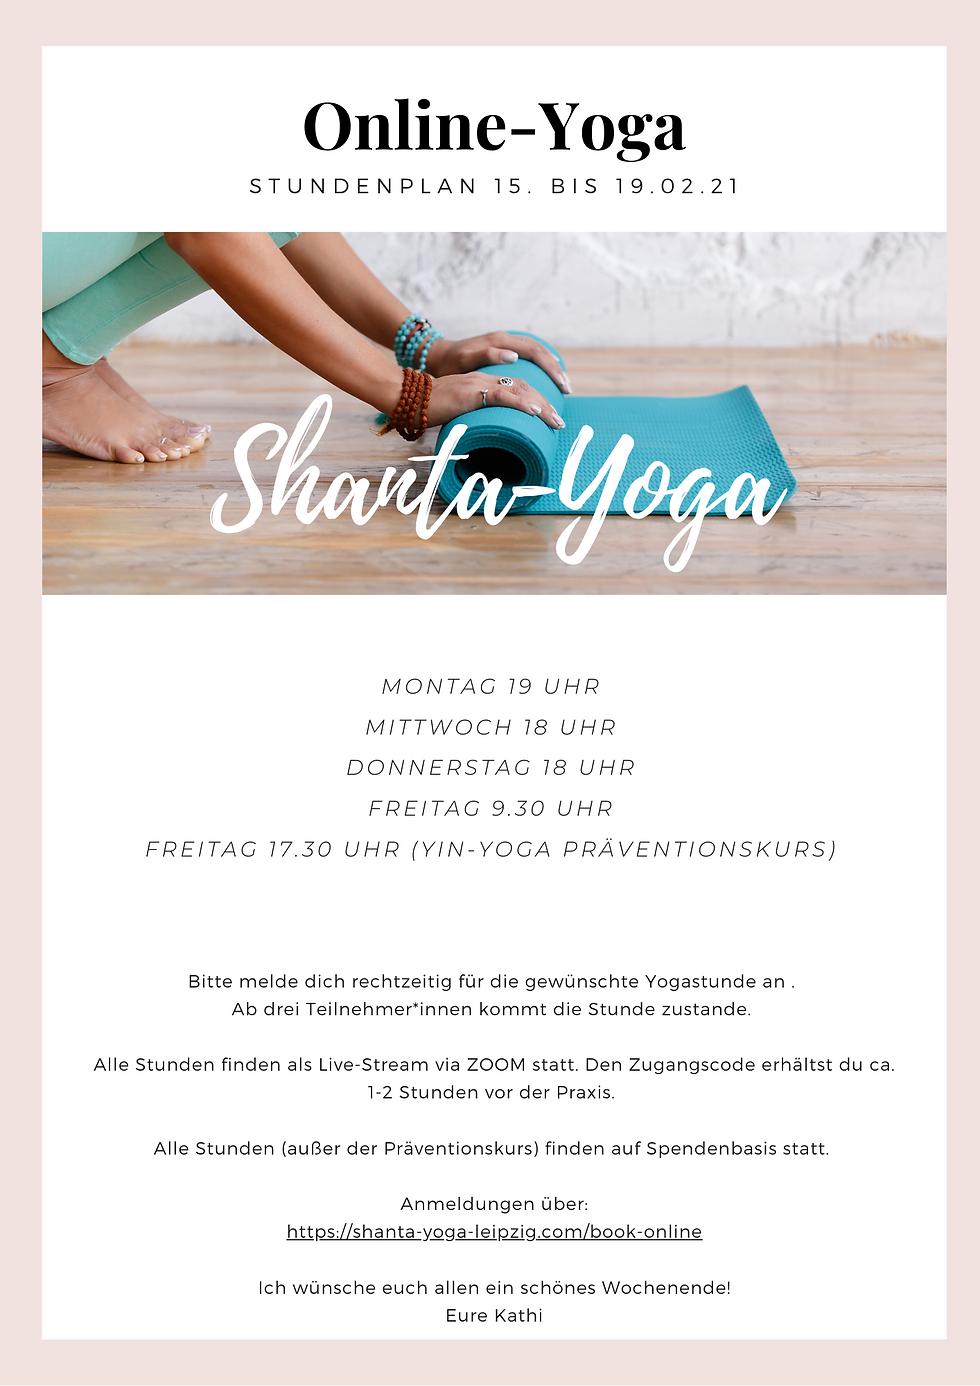 Online-Yoga.png